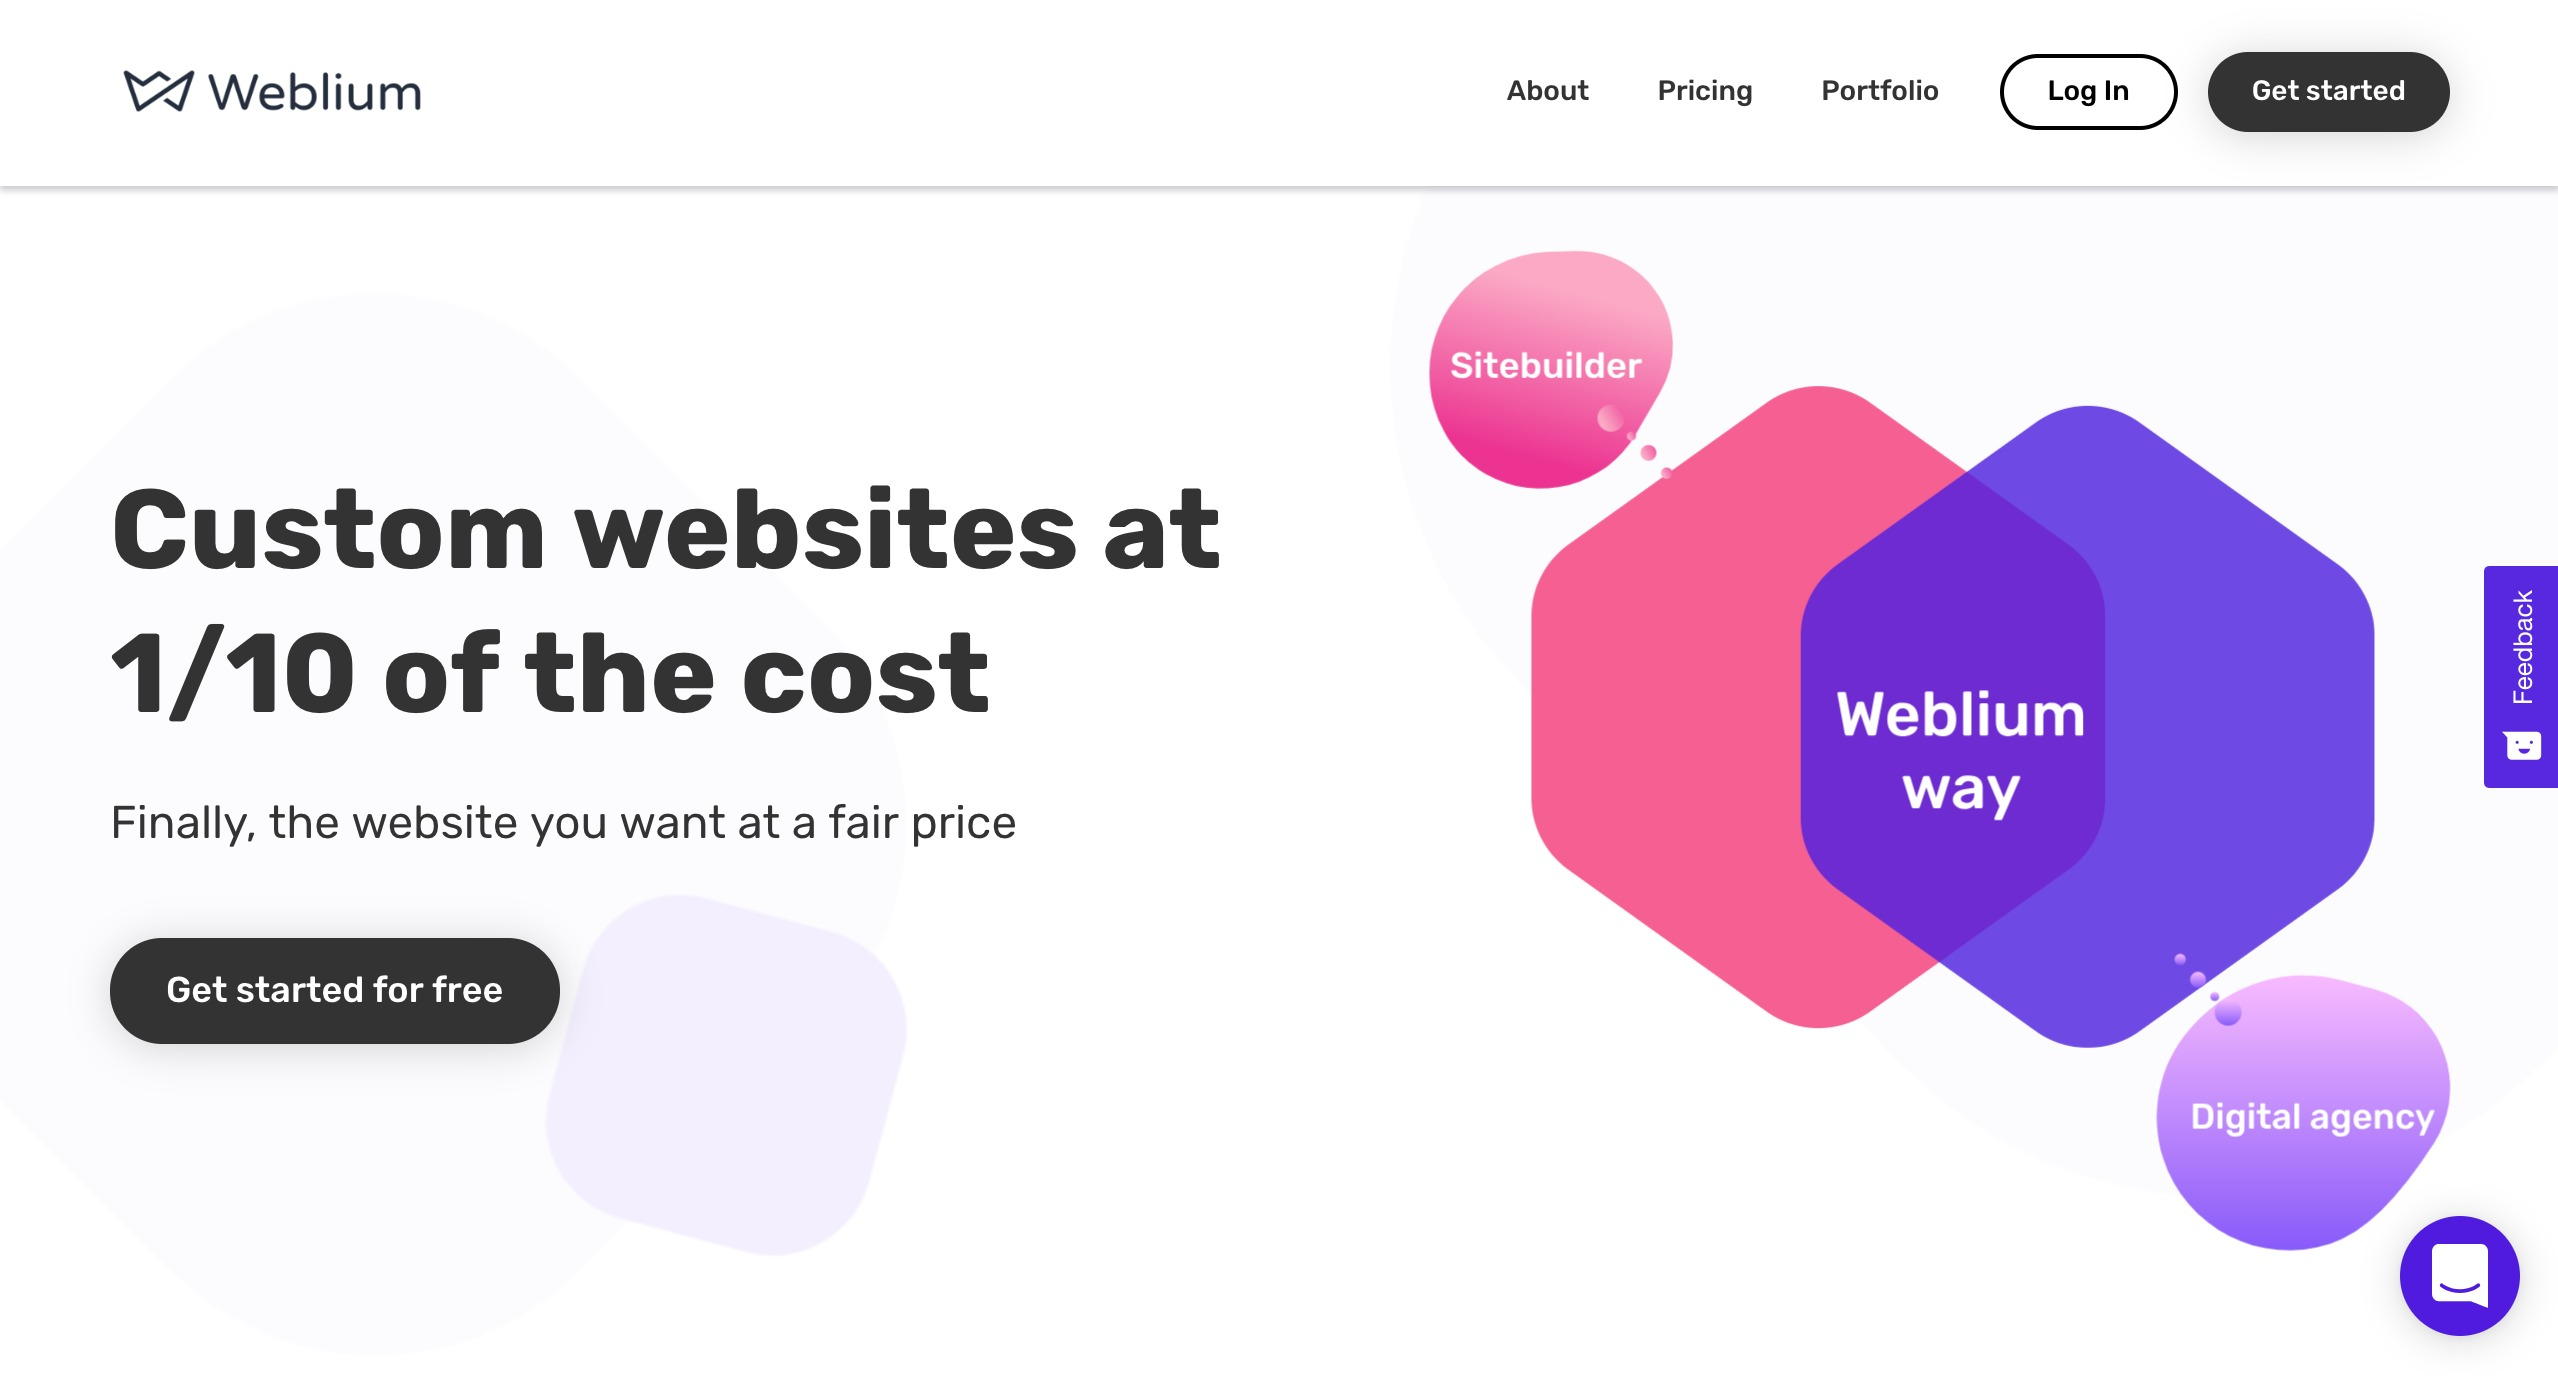 Weblium do-it-for-me website builder